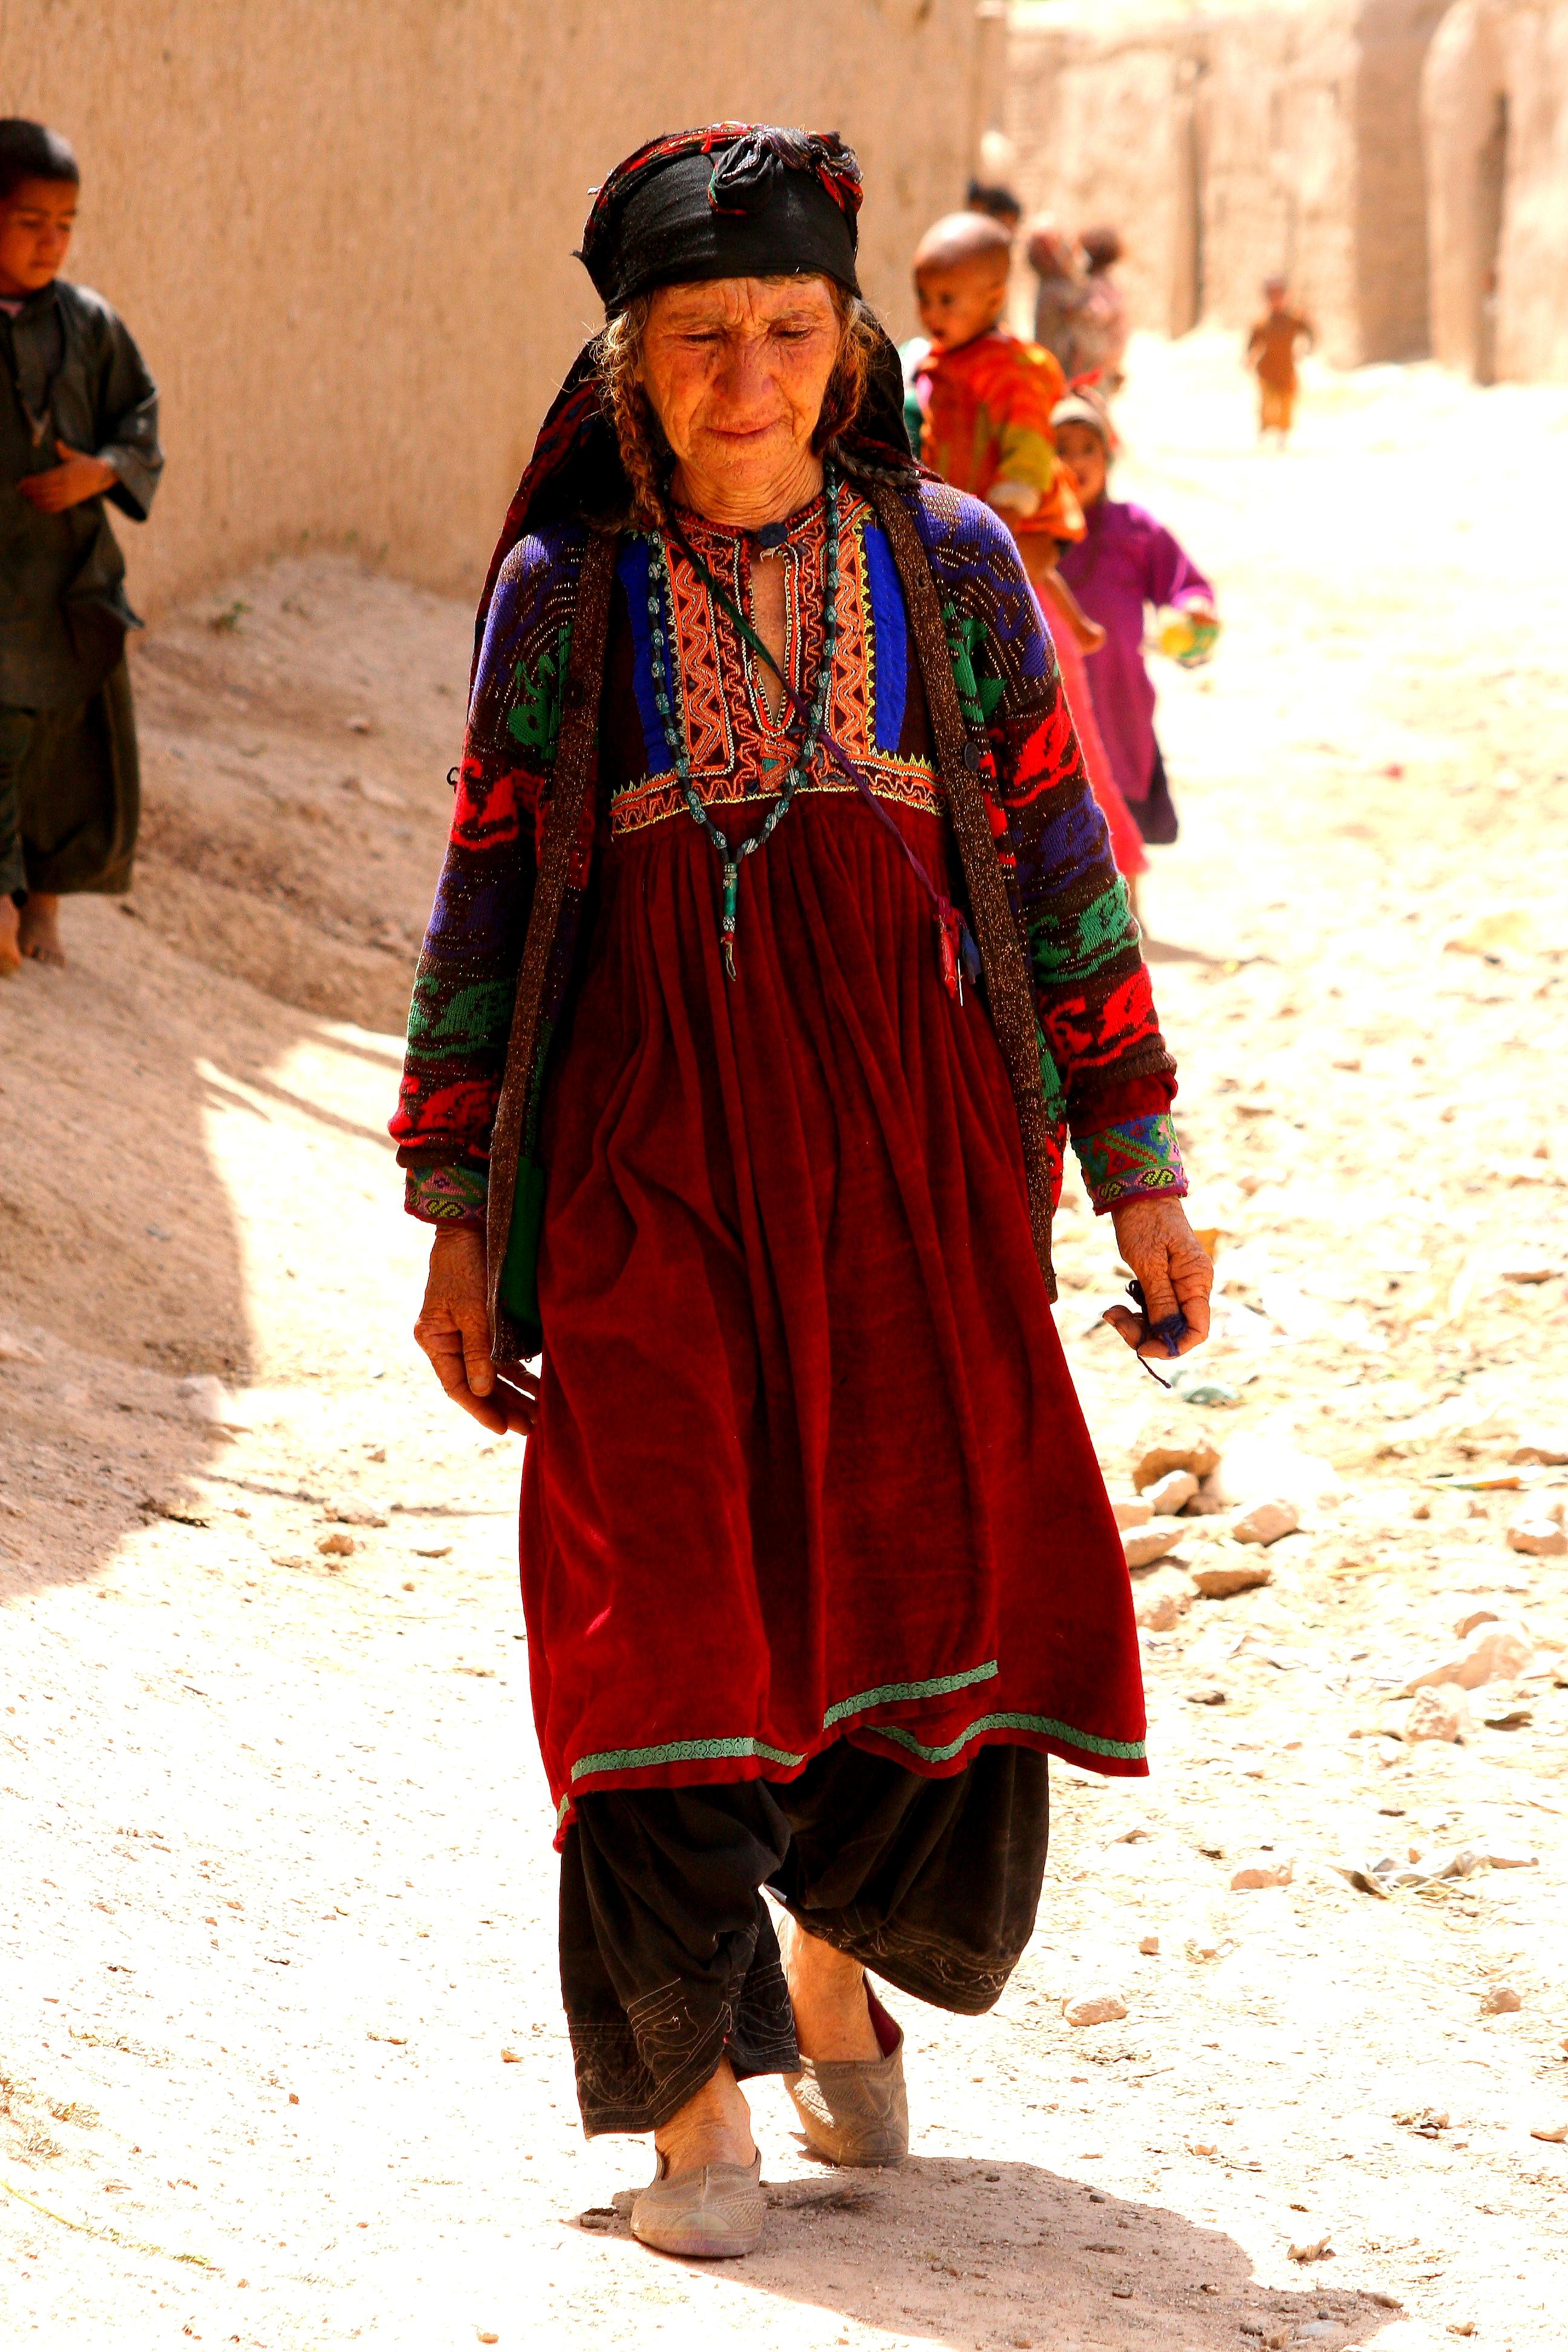 Woman in traditional Afghan dress. Photo: Tahir Bakhtiary, 2013